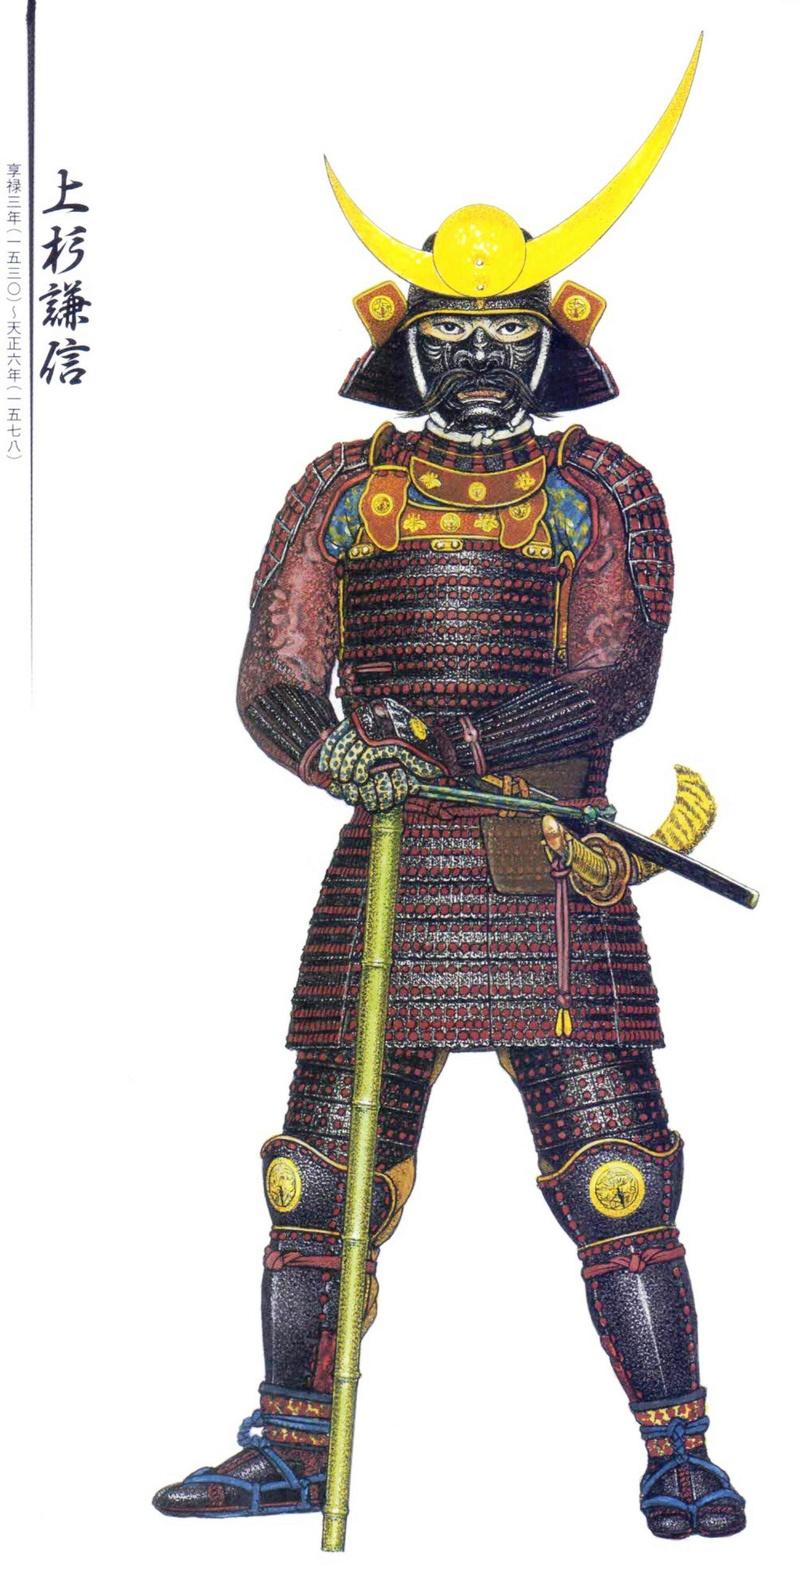 RECHERCHE SUR ARMURE SAMOURAÏ Uesugi10